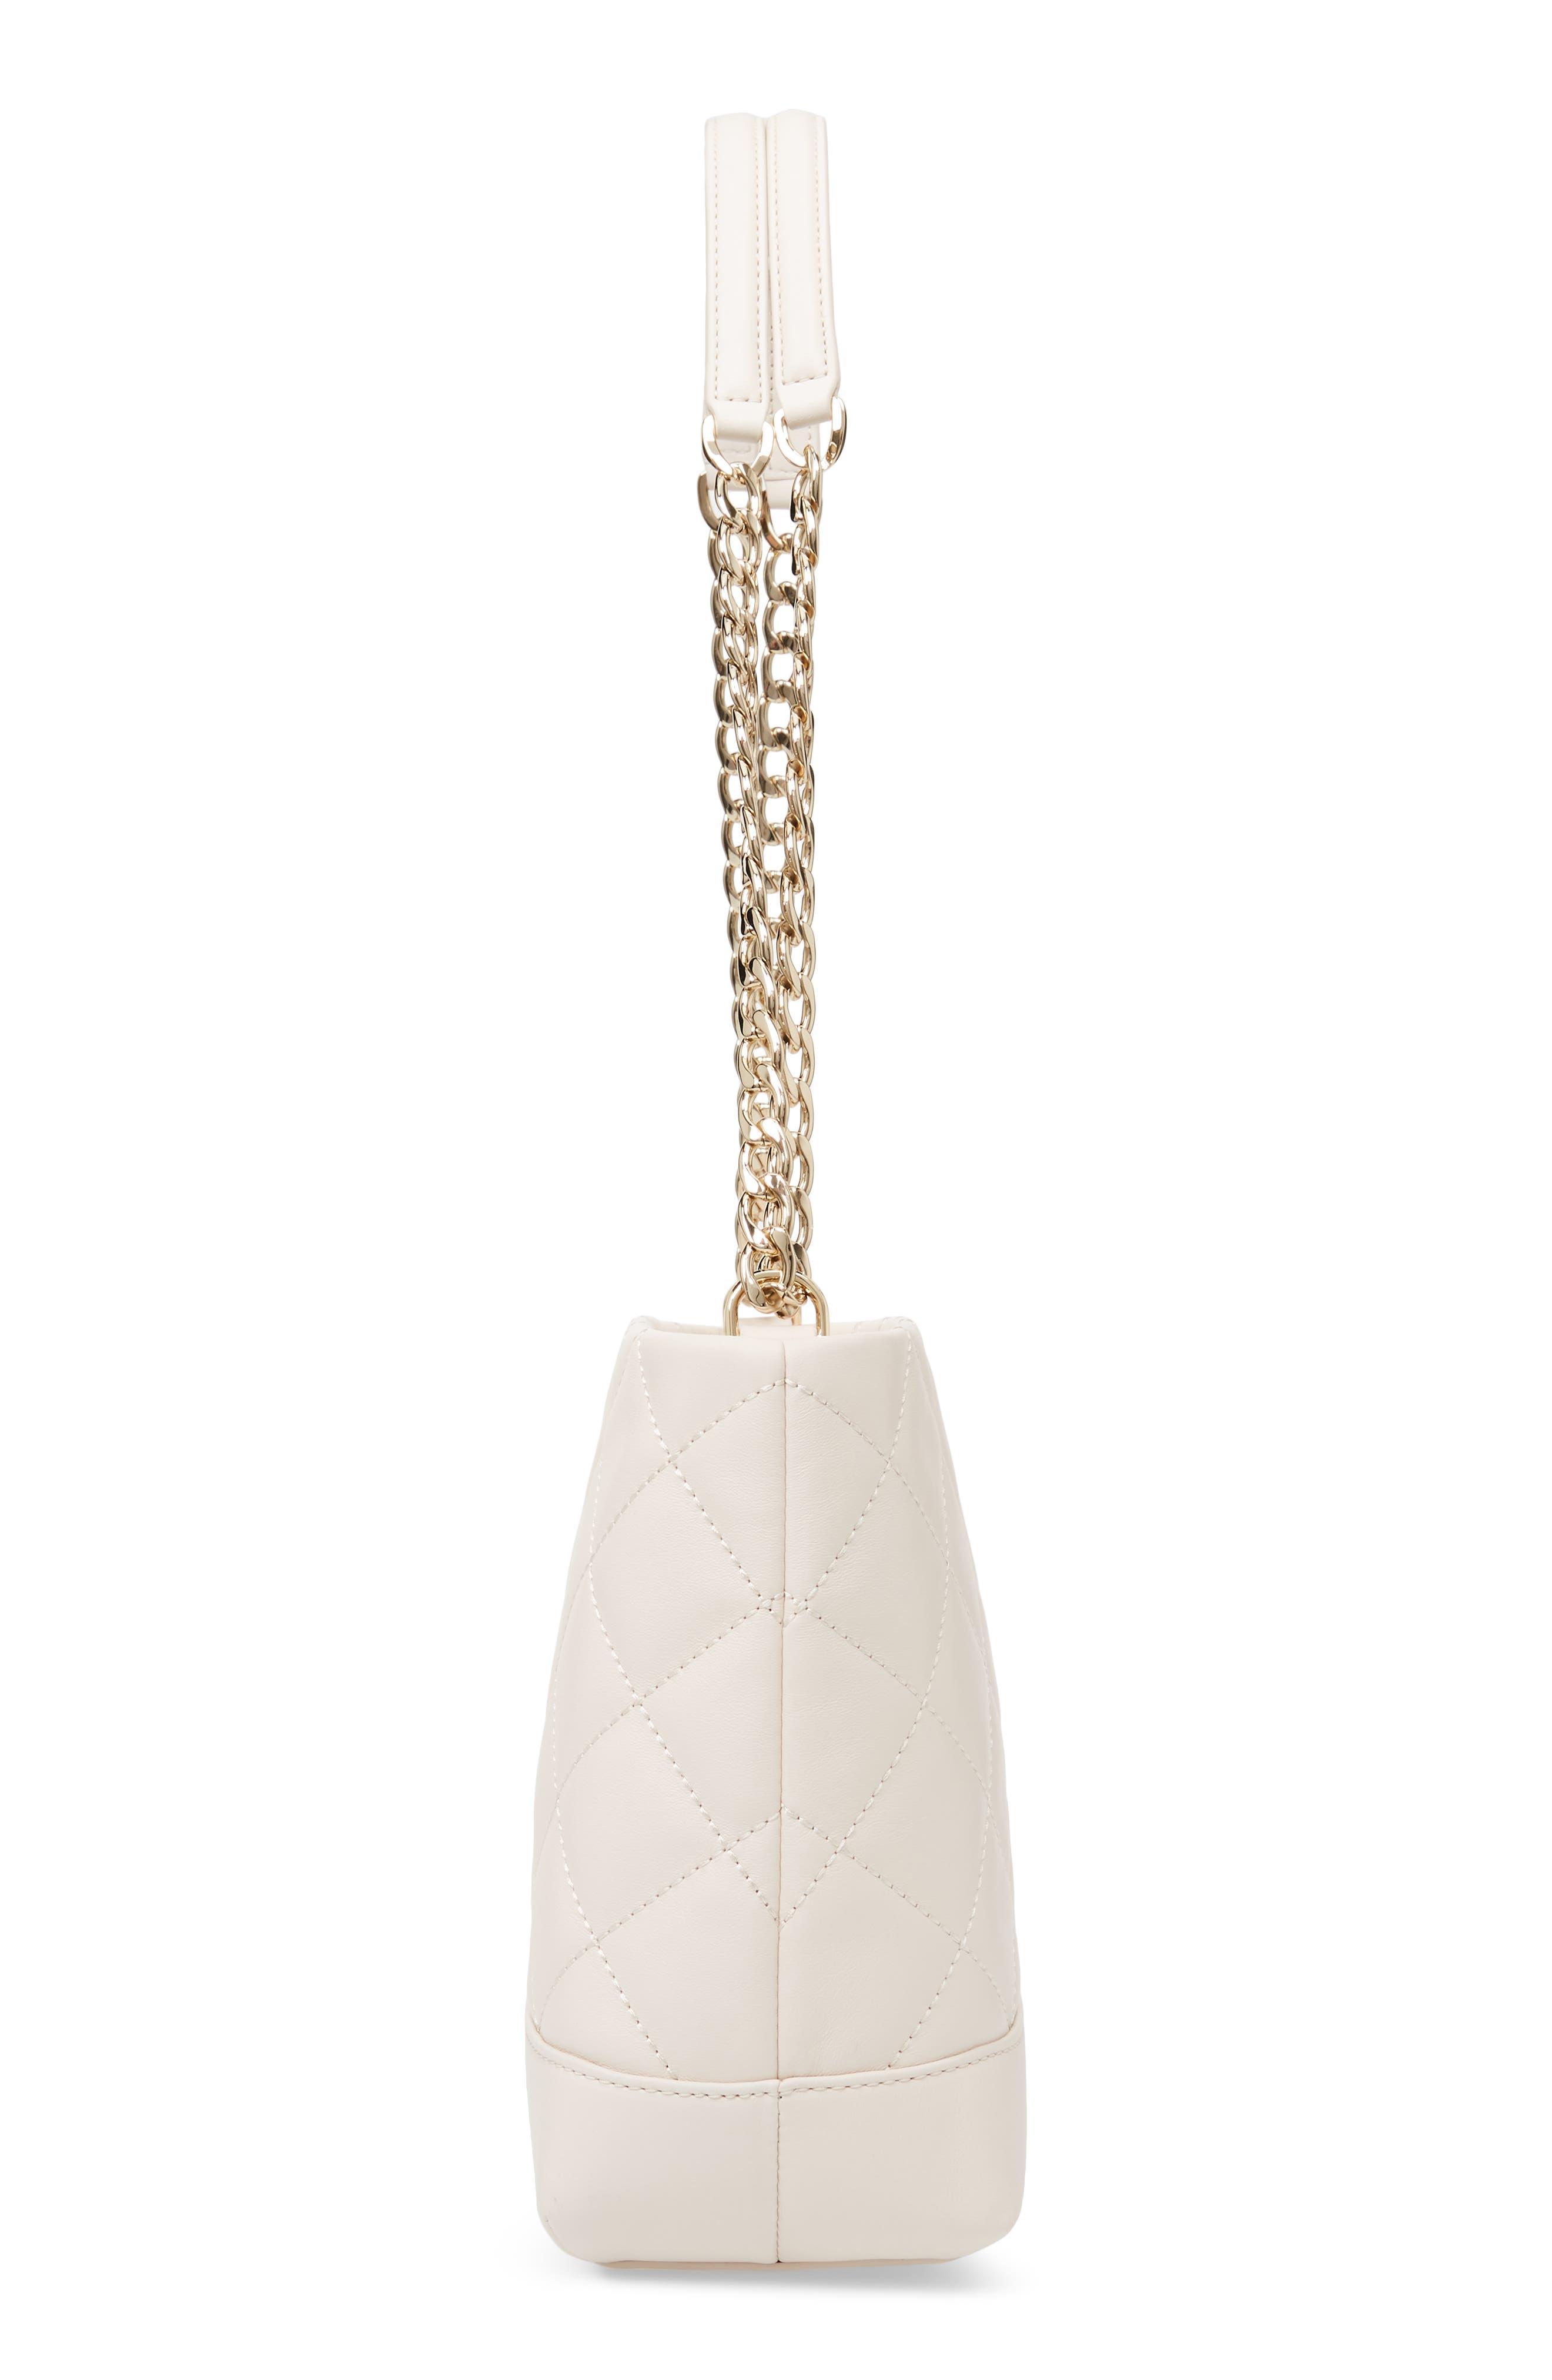 emerson place lorie quilted leather shoulder bag,                             Alternate thumbnail 5, color,                             BLEACH BONE